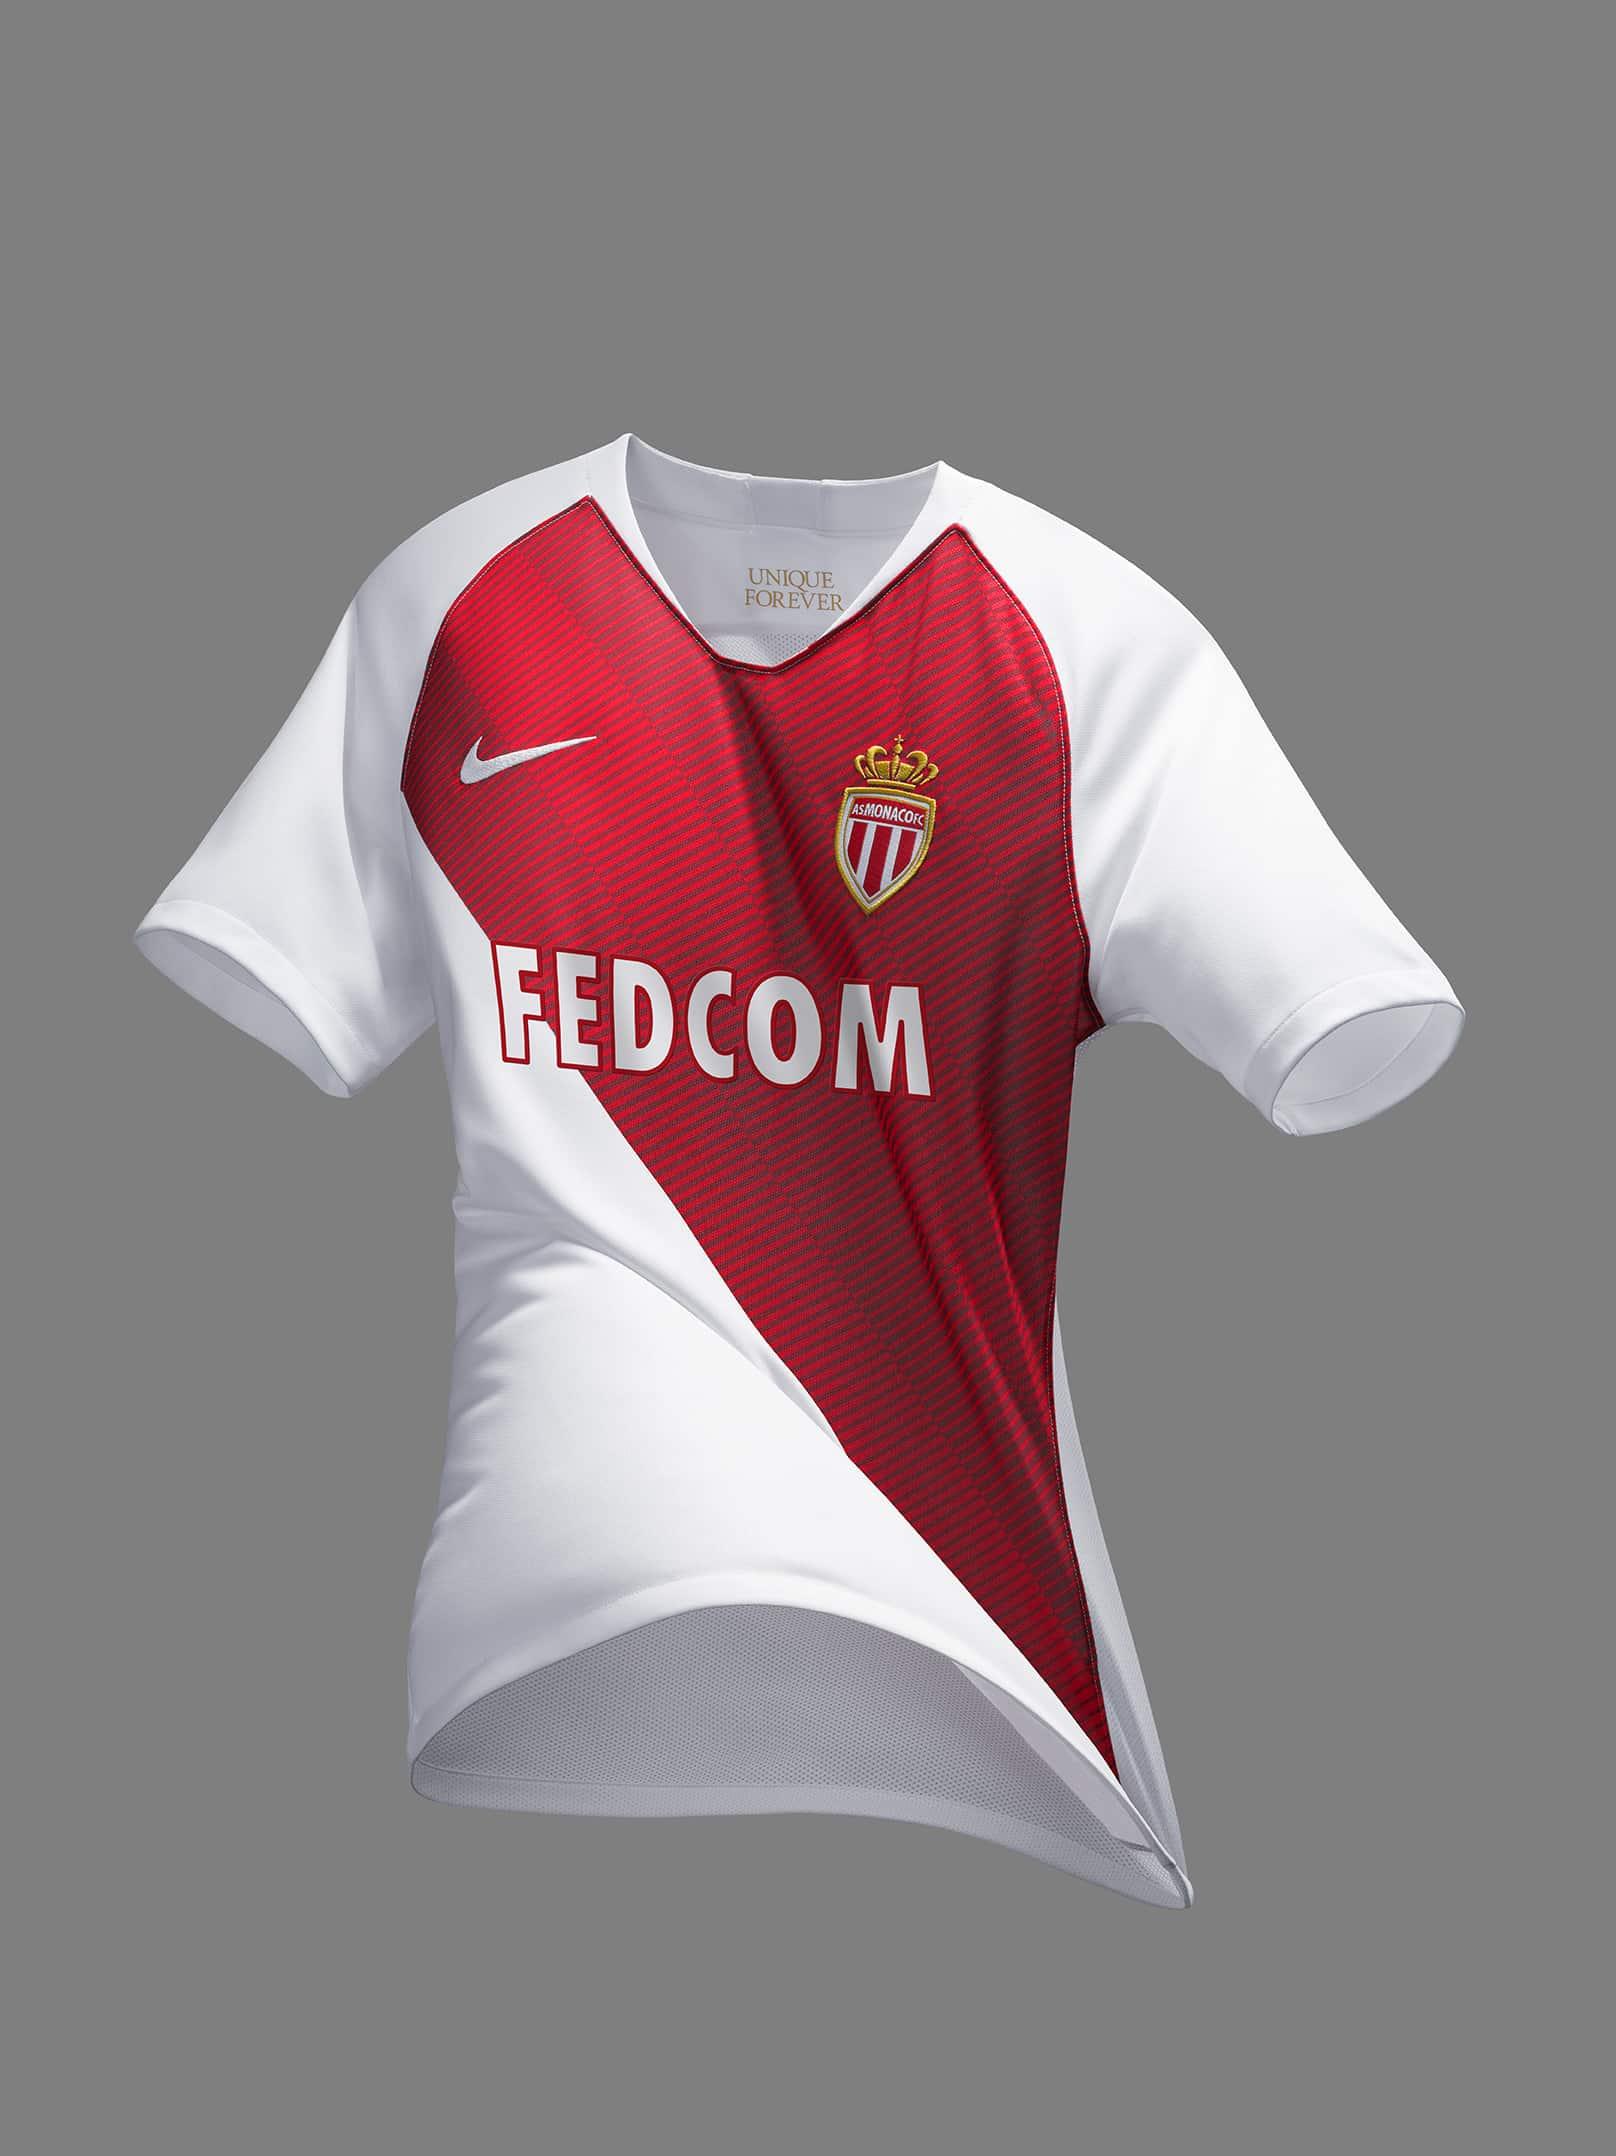 maillot-football-nike-as-monaco-2018-2019-juillet-2018-4